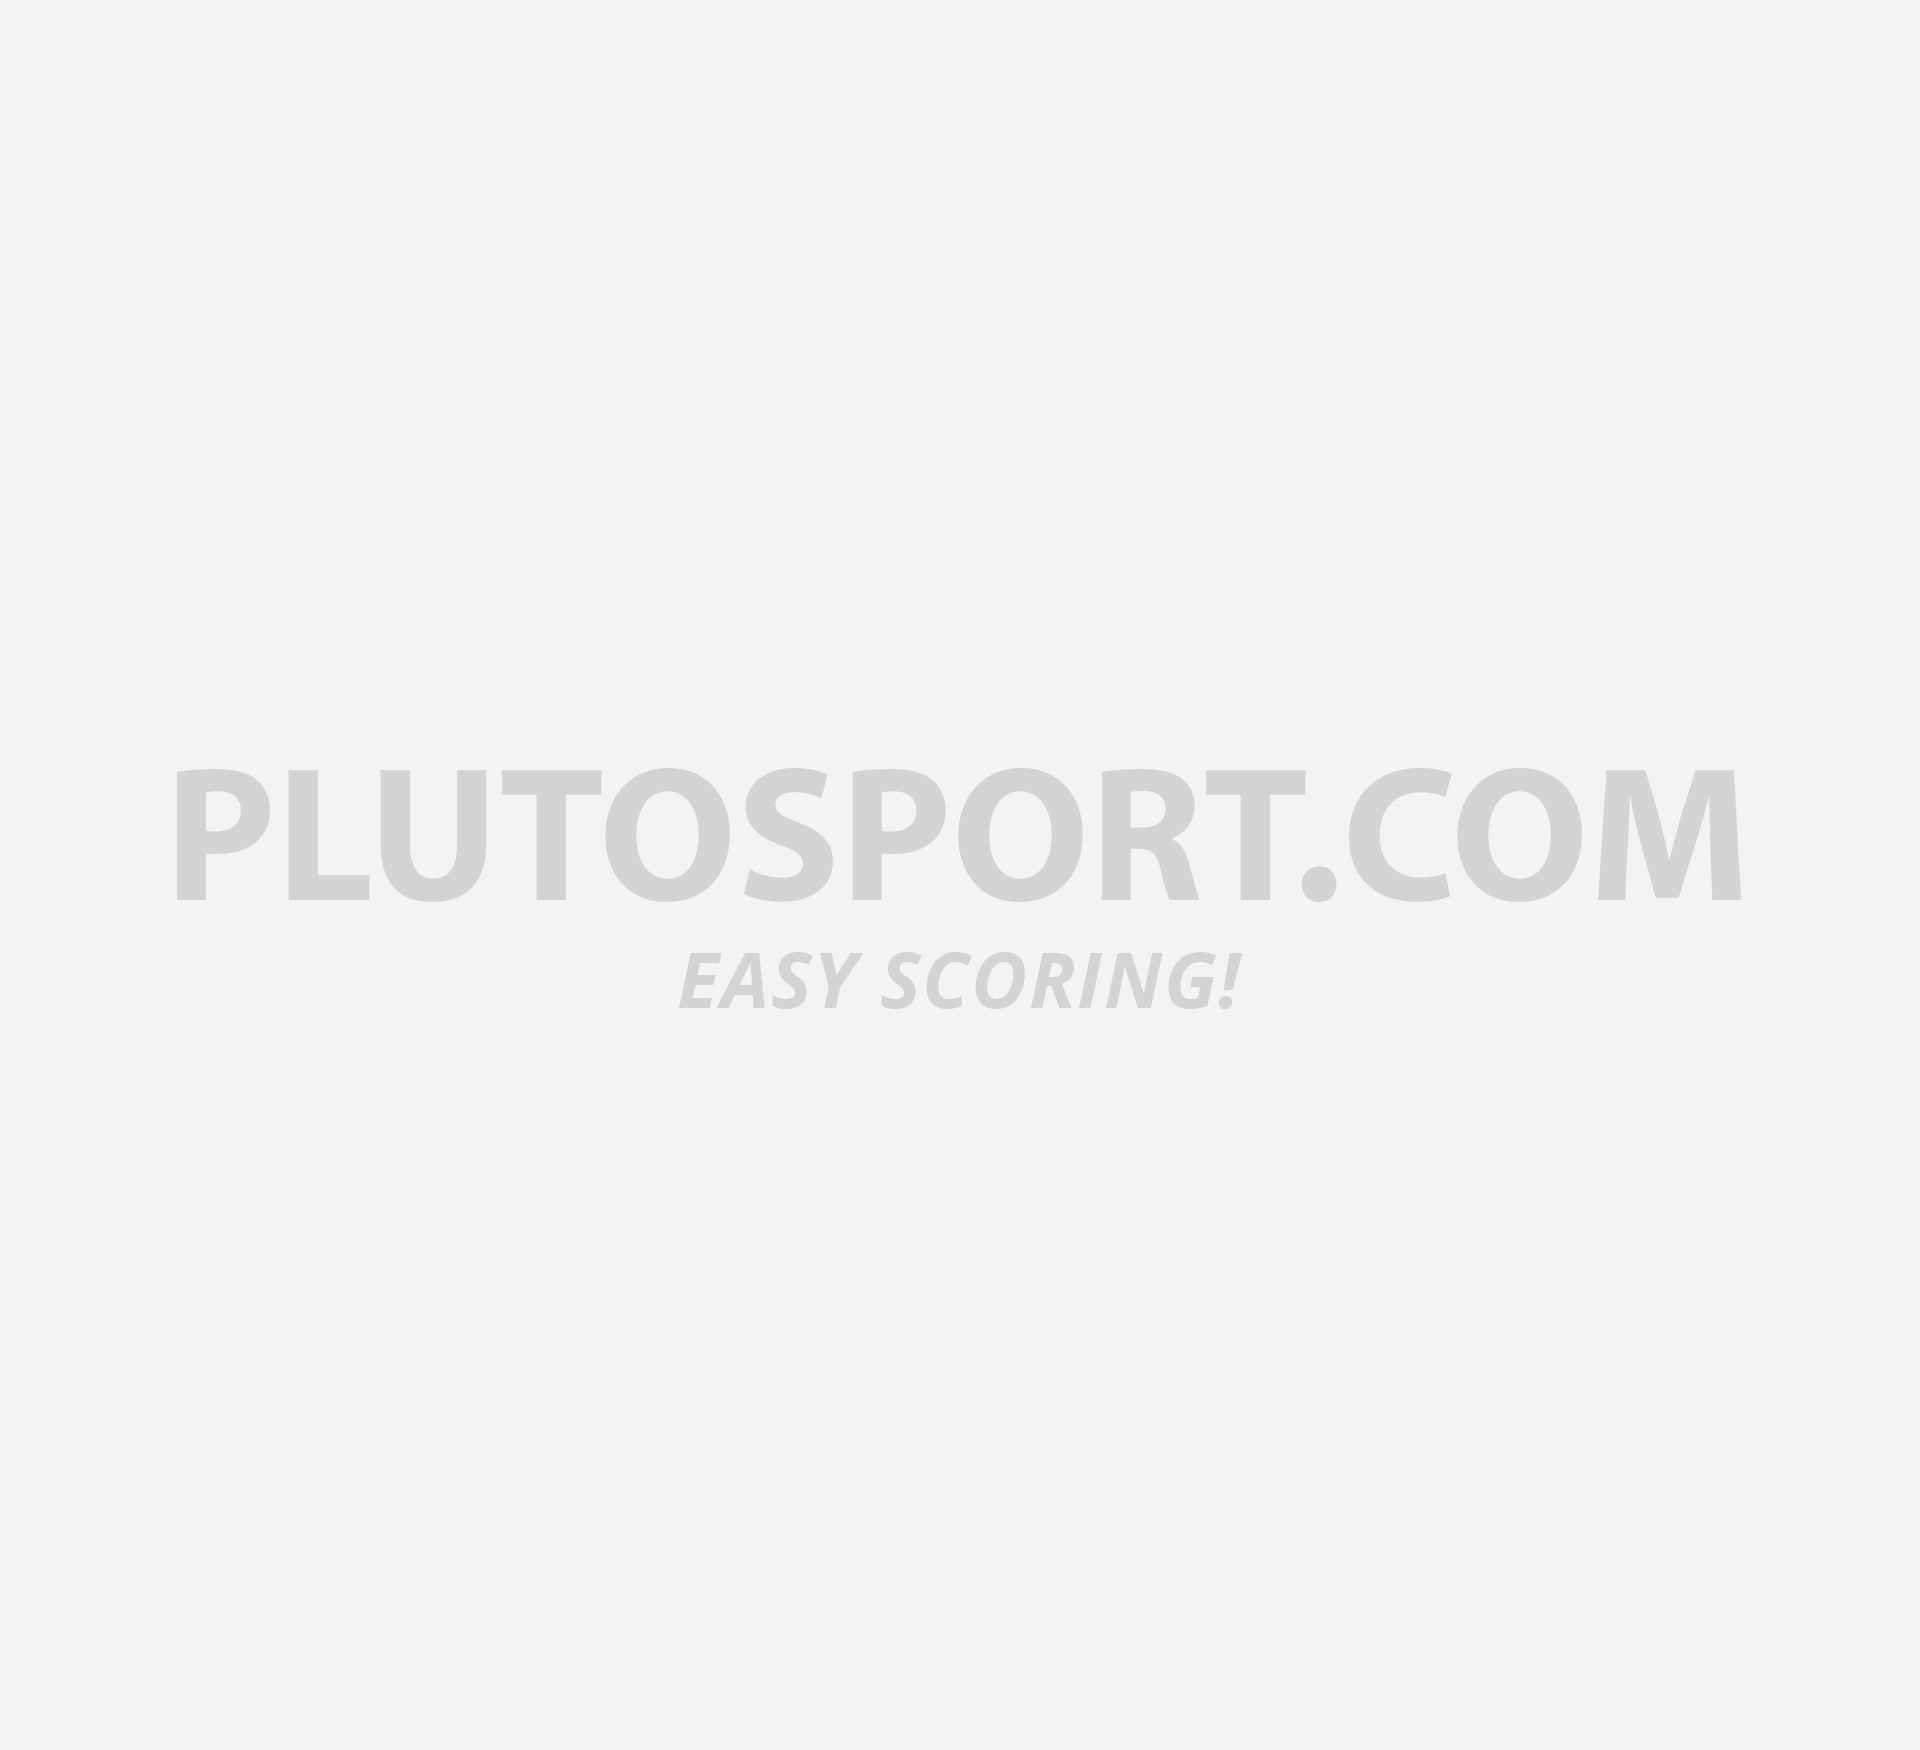 507889ba1f59a5 Superdry Retro Work Barrel - Accessories - Yoga - Sports | Plutosport